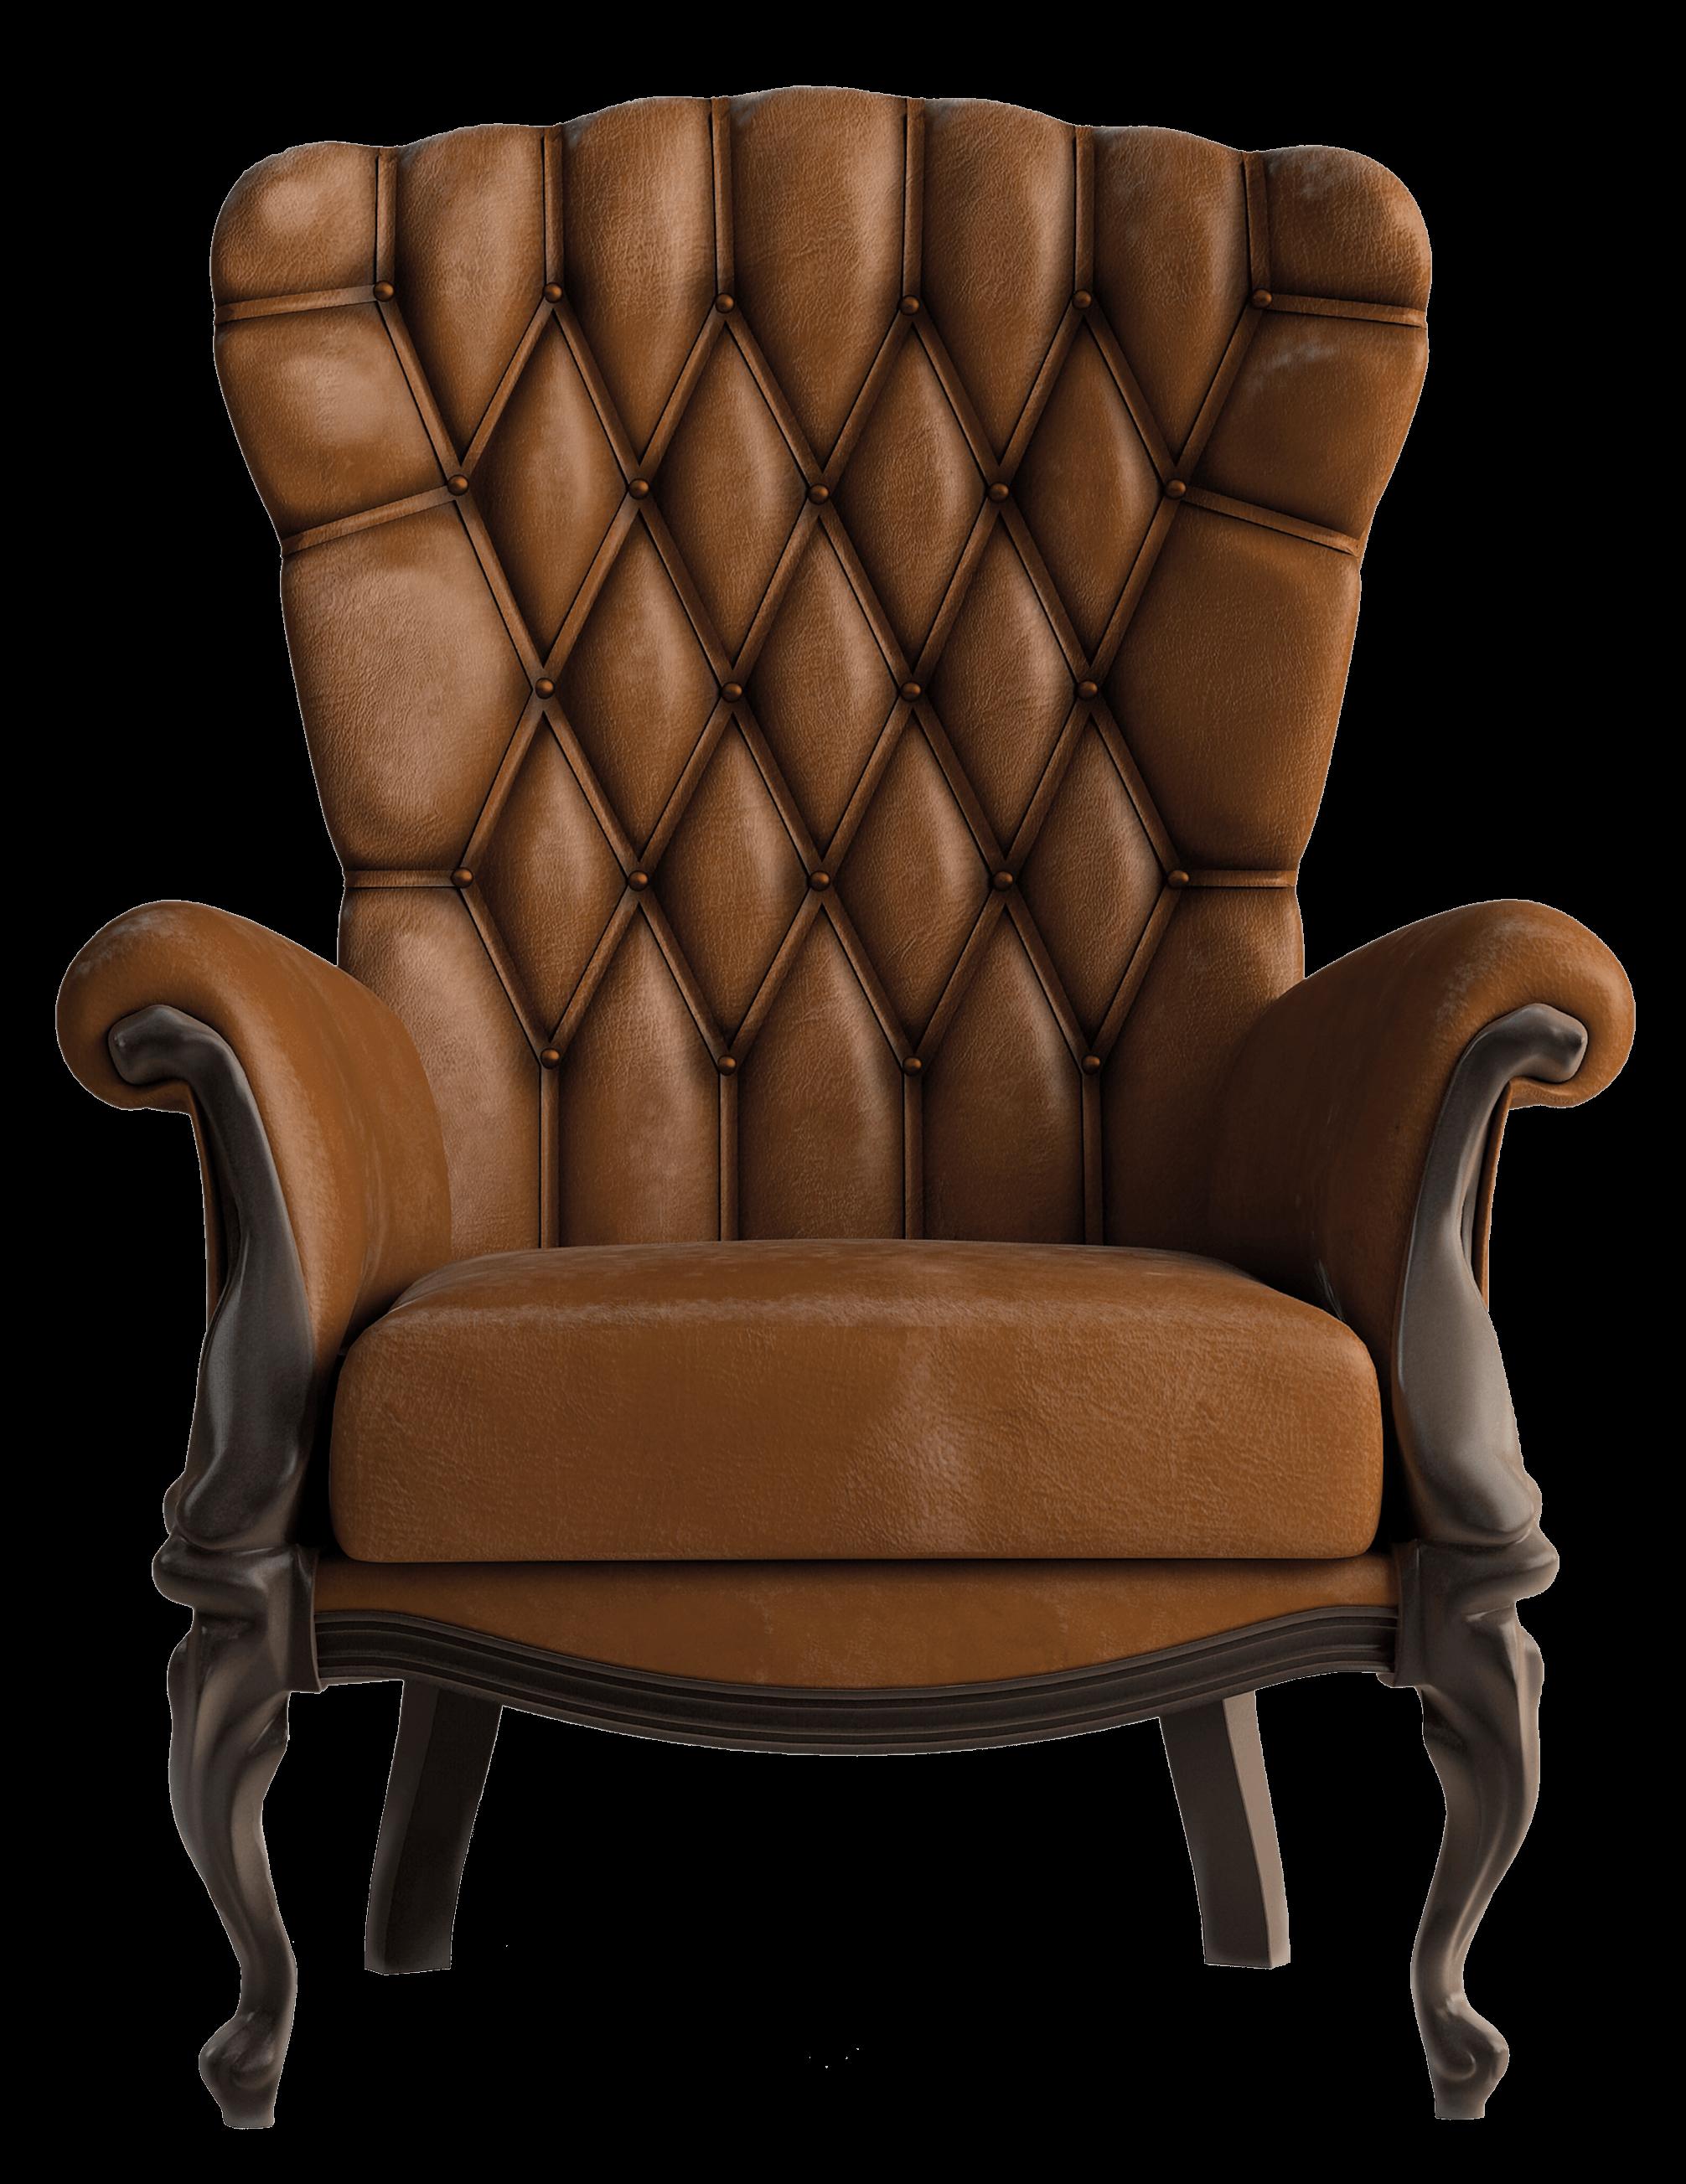 Armchair Vintage Brown - Armchair, Transparent background PNG HD thumbnail